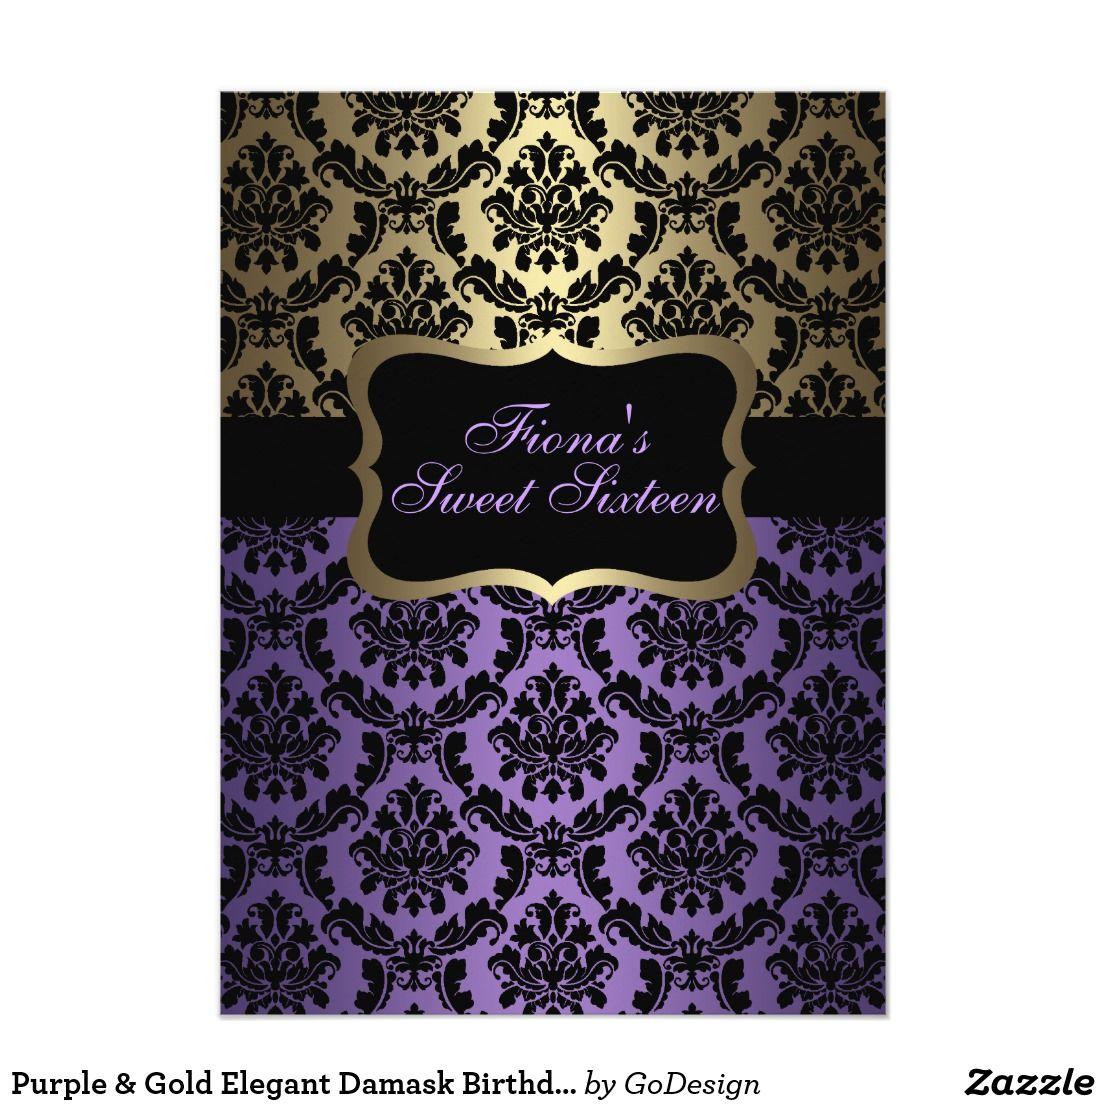 Purple & Gold Elegant Damask Birthday Invite | Sixteenth birthday ...